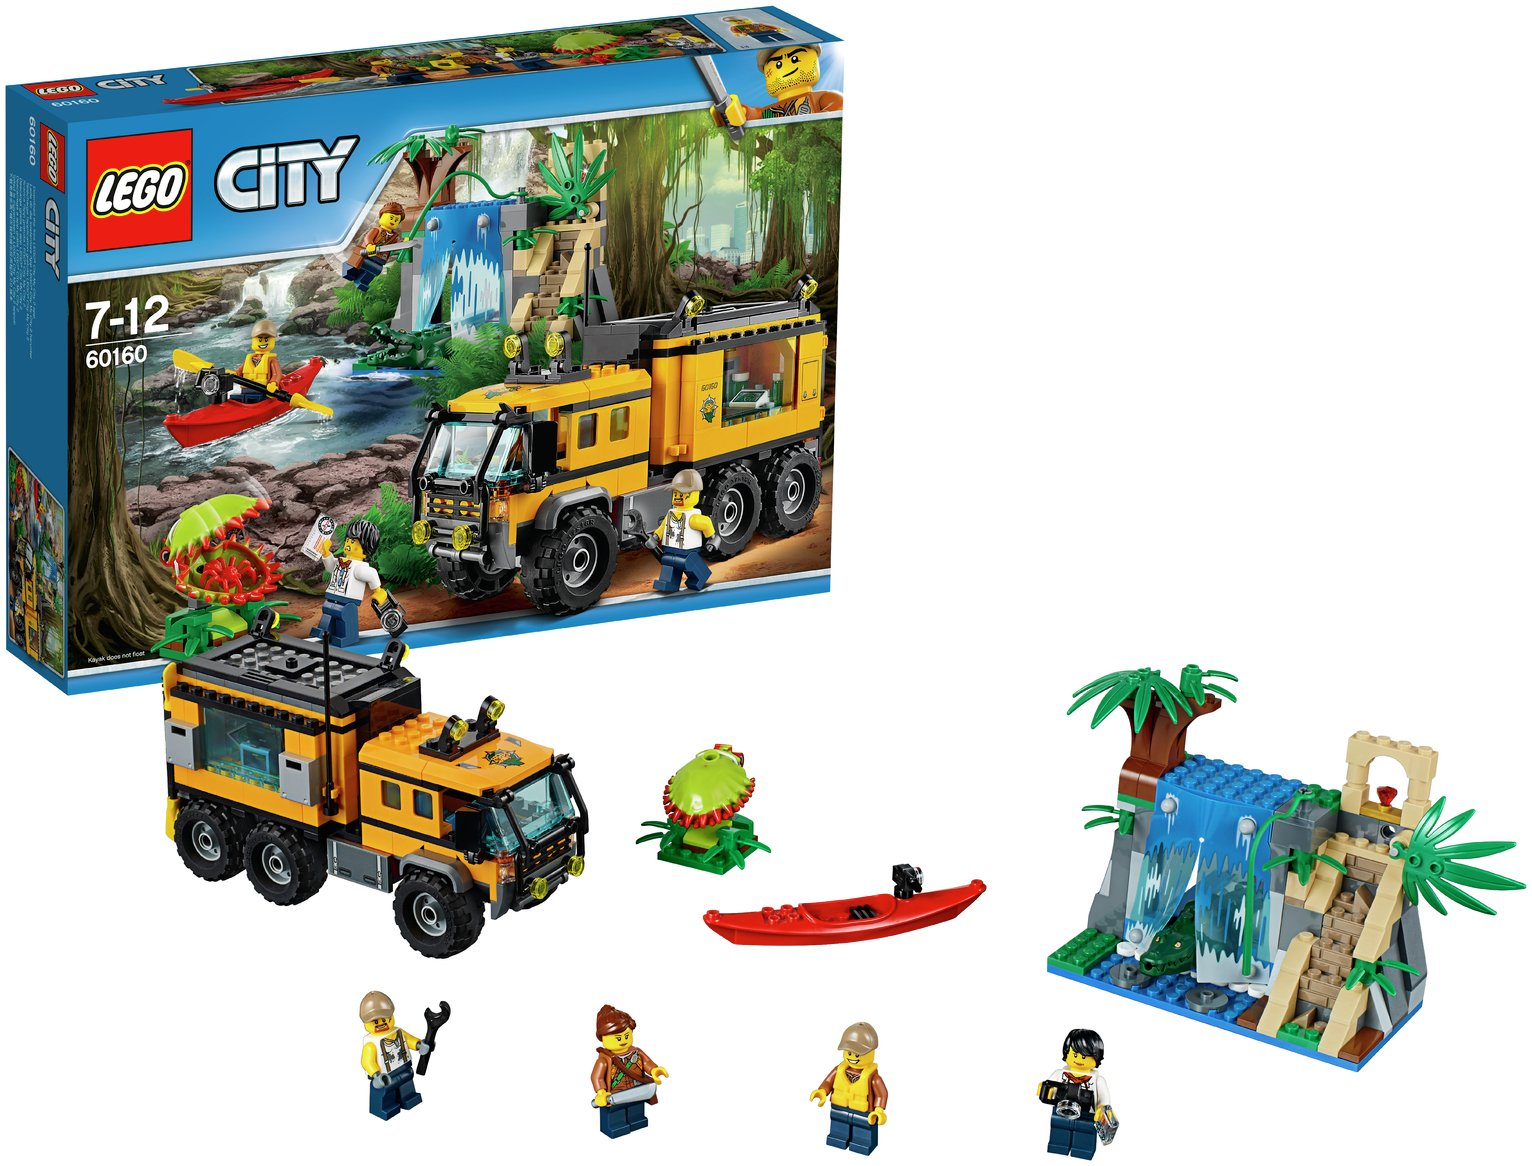 Buy LEGO City Jungle Mobile Lab - 60160   LEGO   Argos